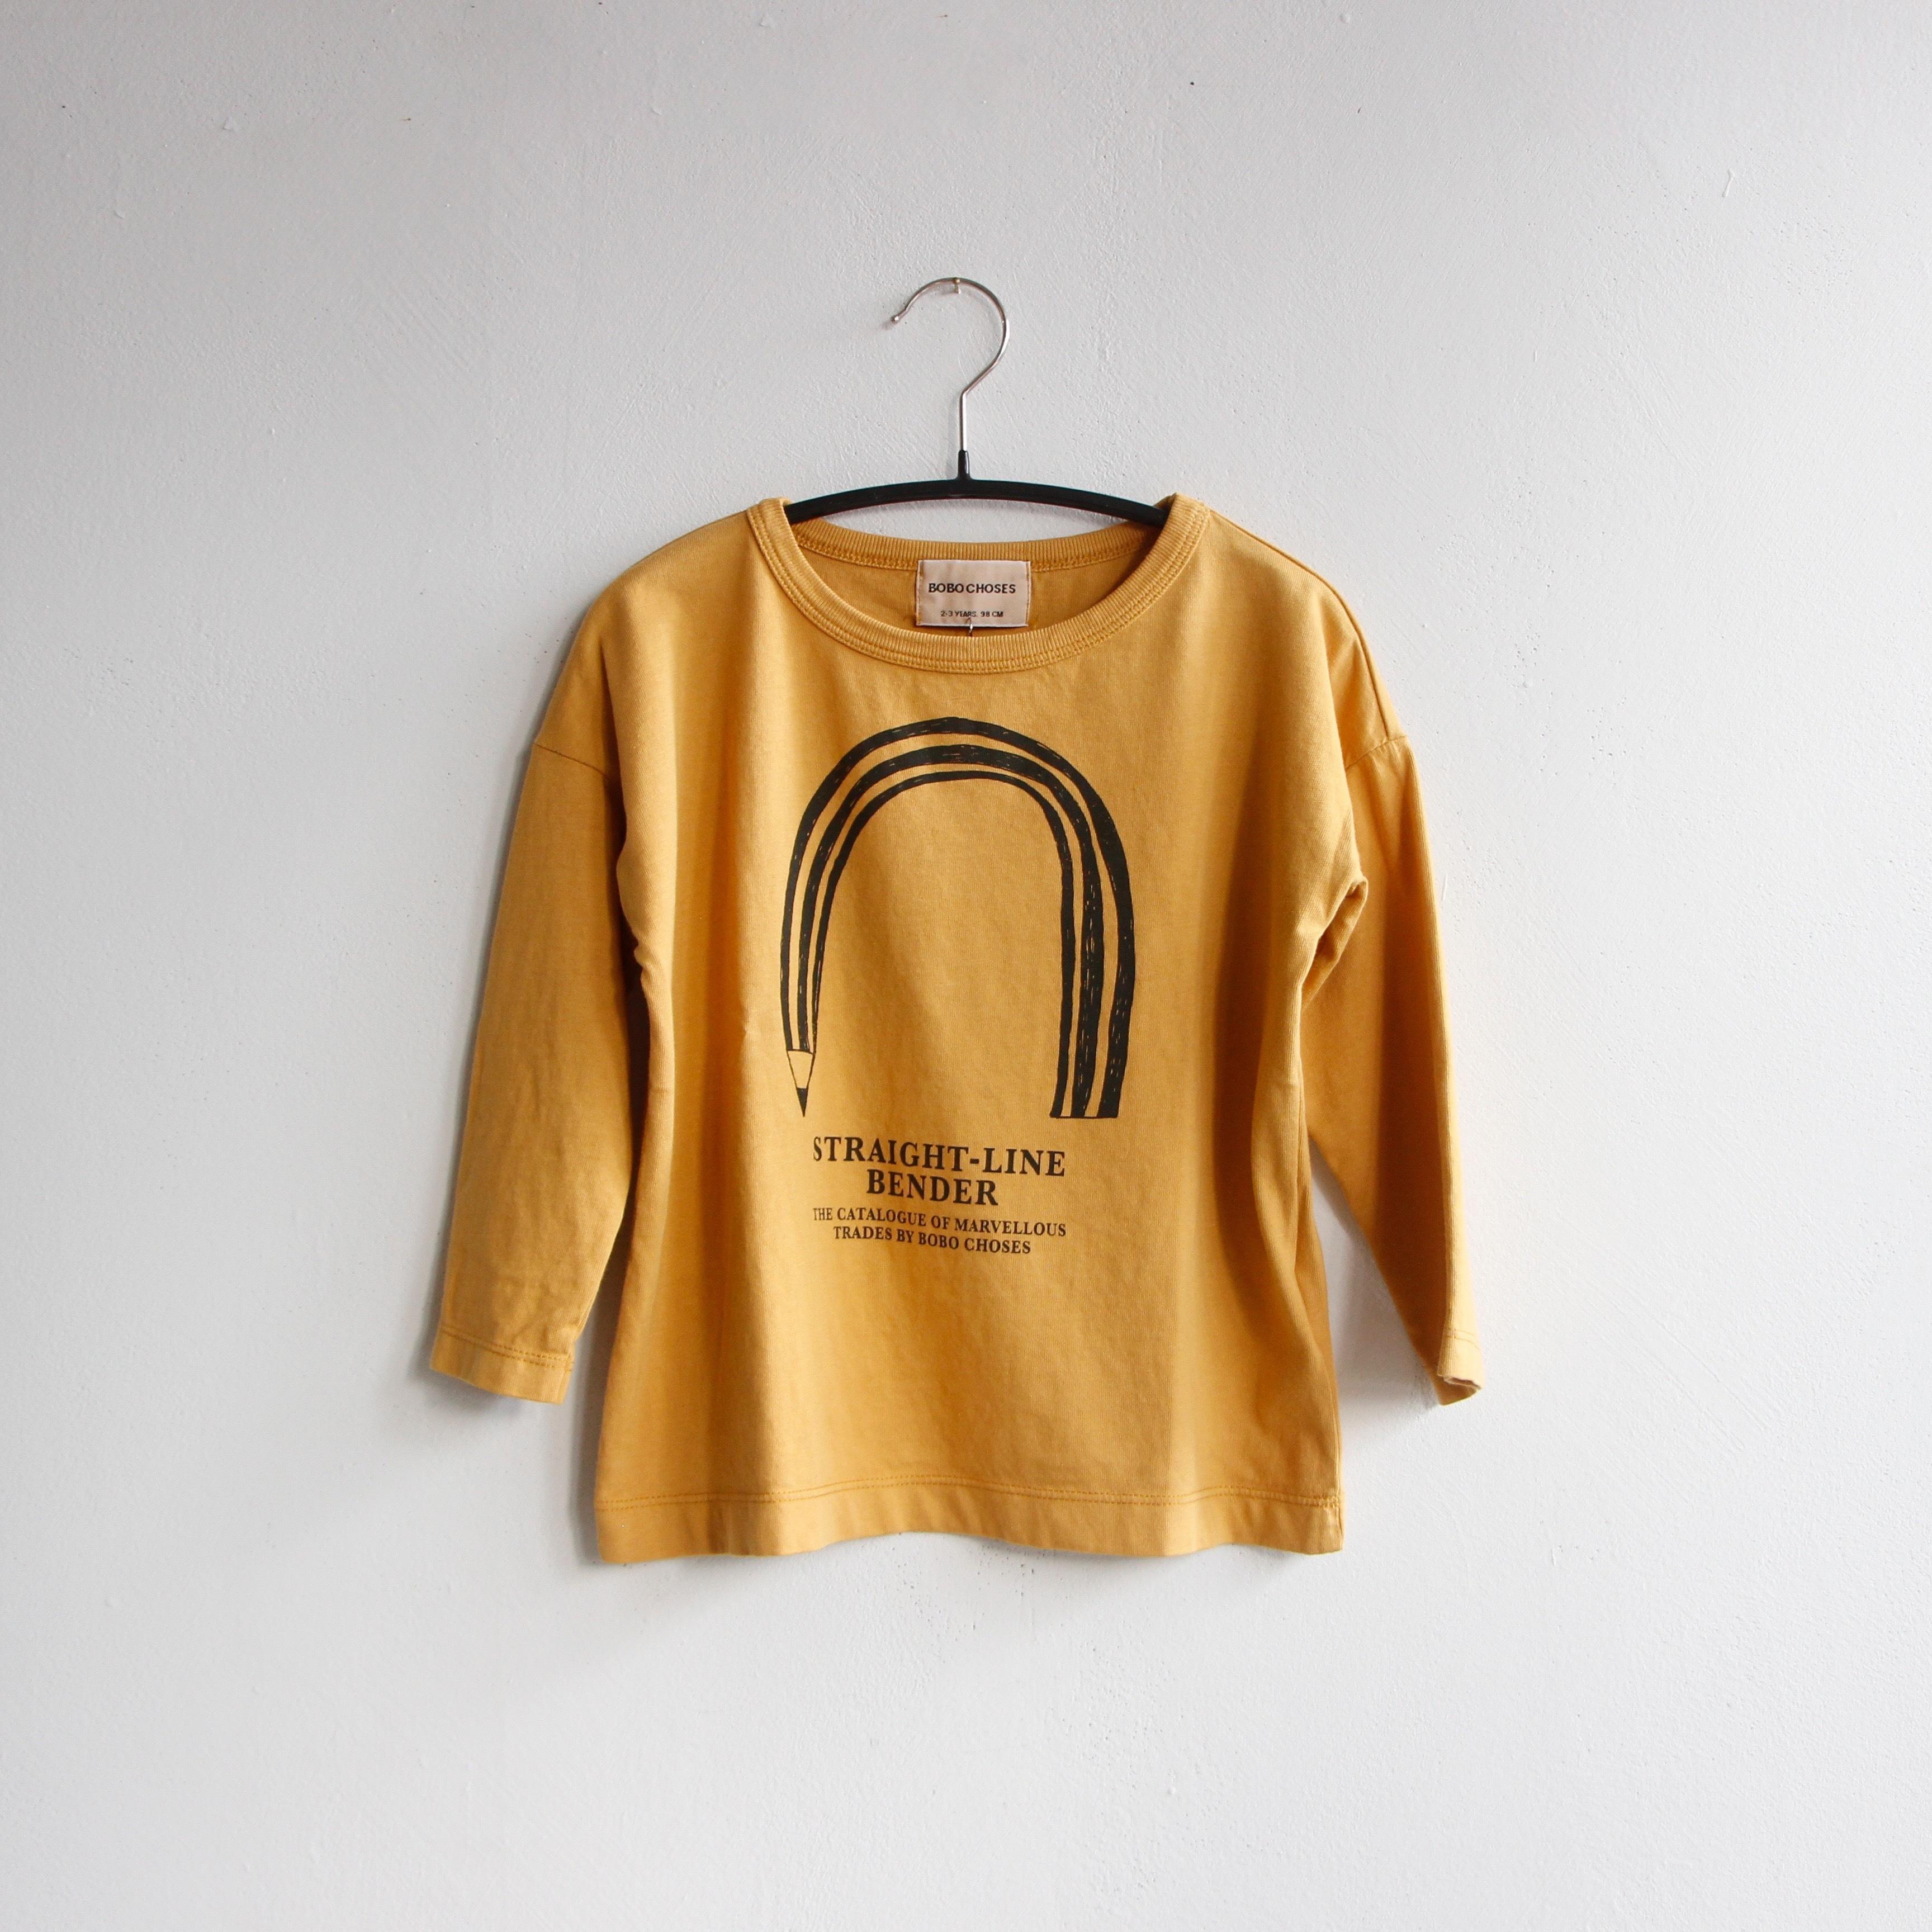 《BOBO CHOSES 2020AW》Straight Line Bender long sleeve T-shirt / 2-9Y